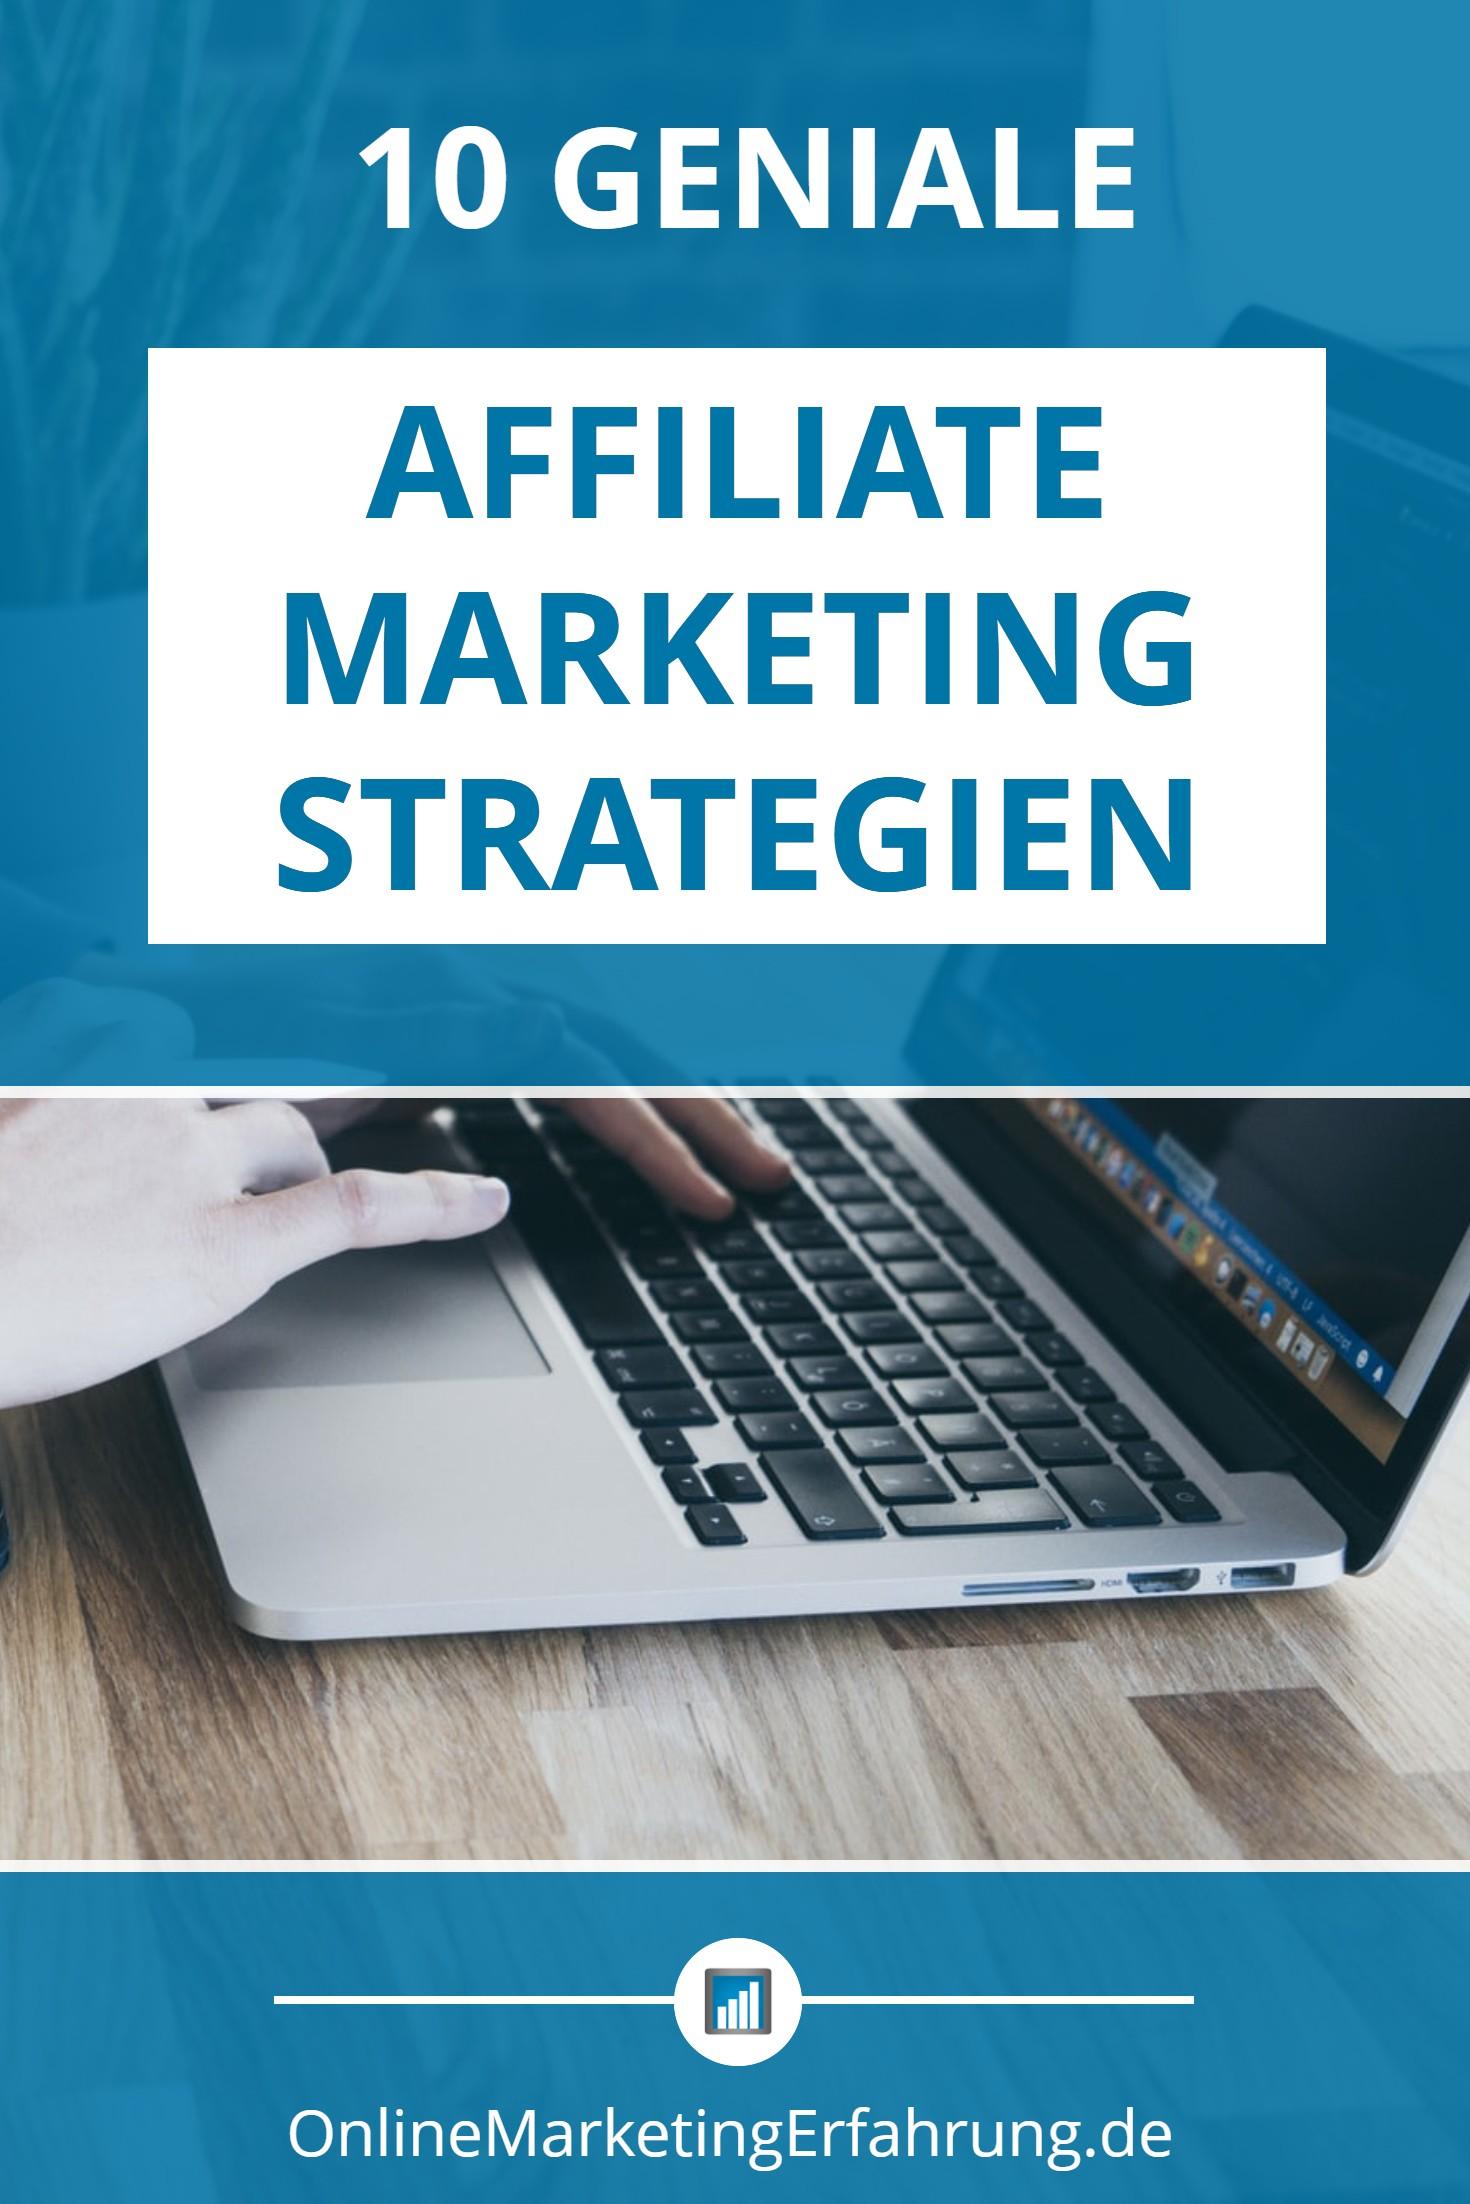 Affiliate Marketing Strategien